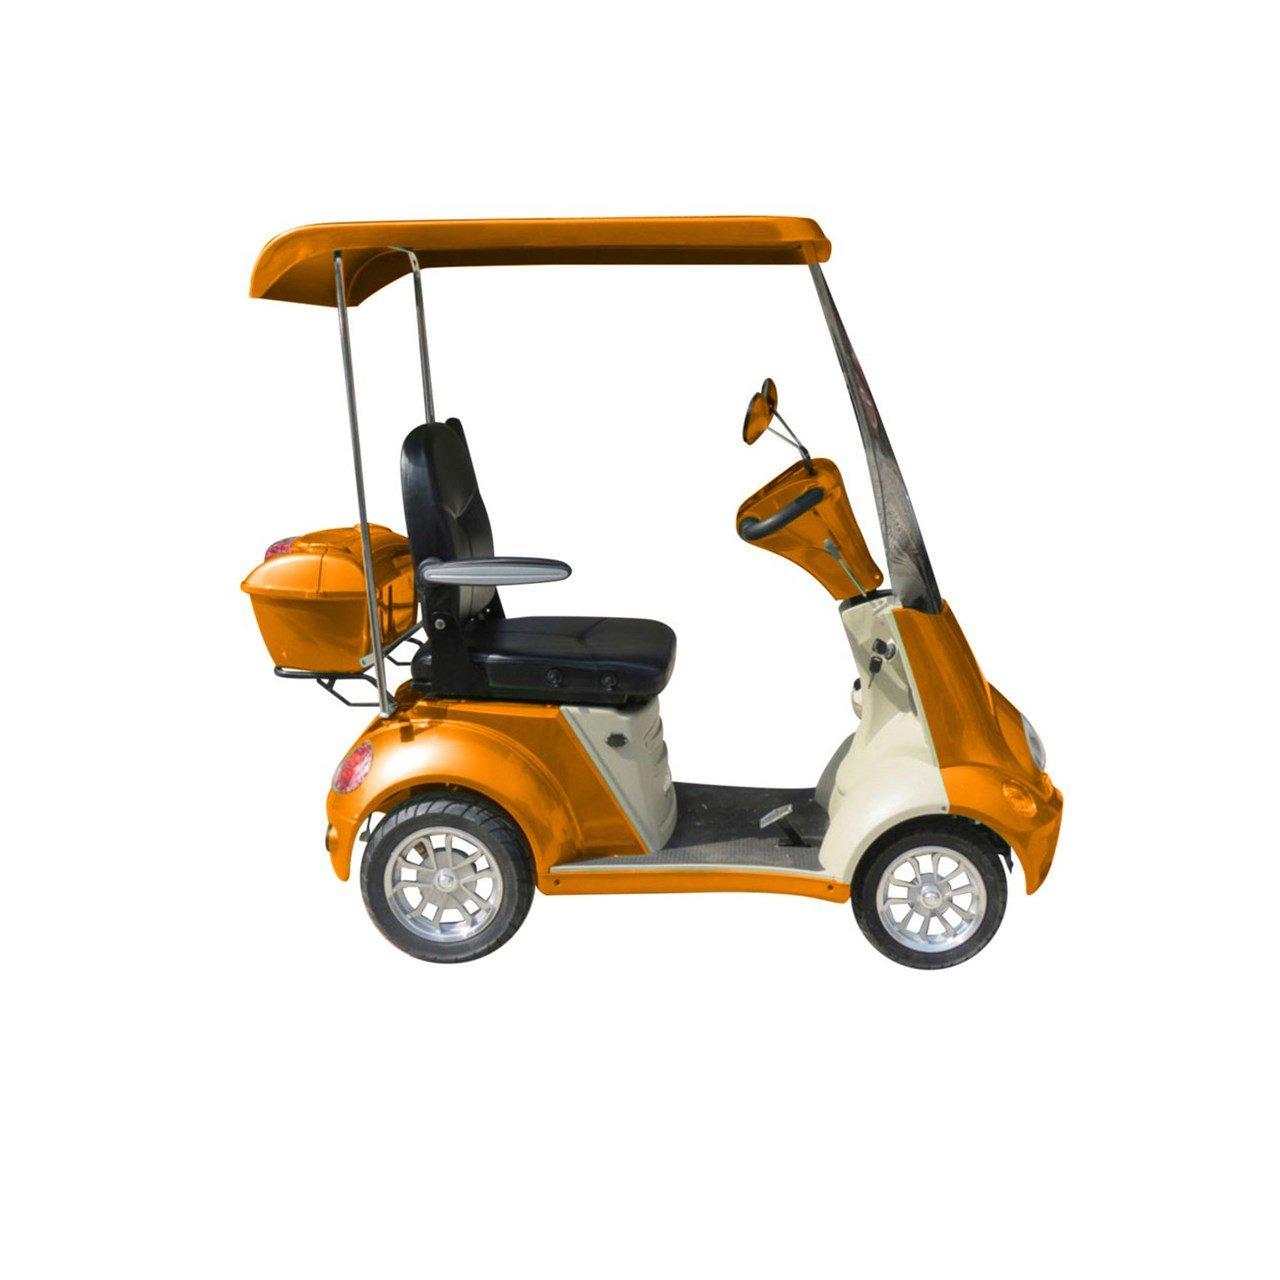 E-Wheels EW-54 4-Wheel Buggie Electric Mobility Scooter - Orange